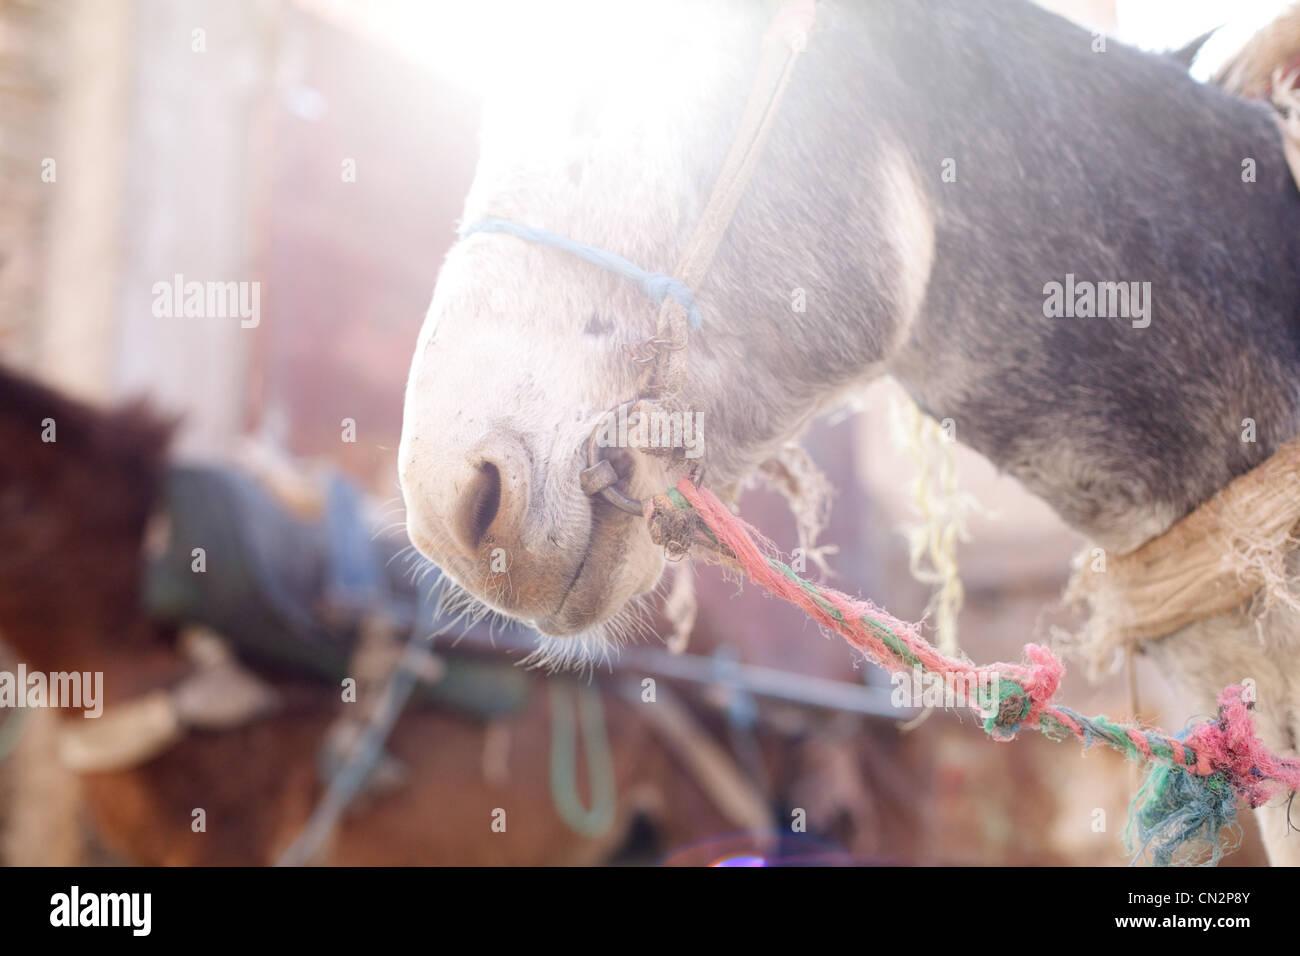 Donkey's head, crop Stock Photo